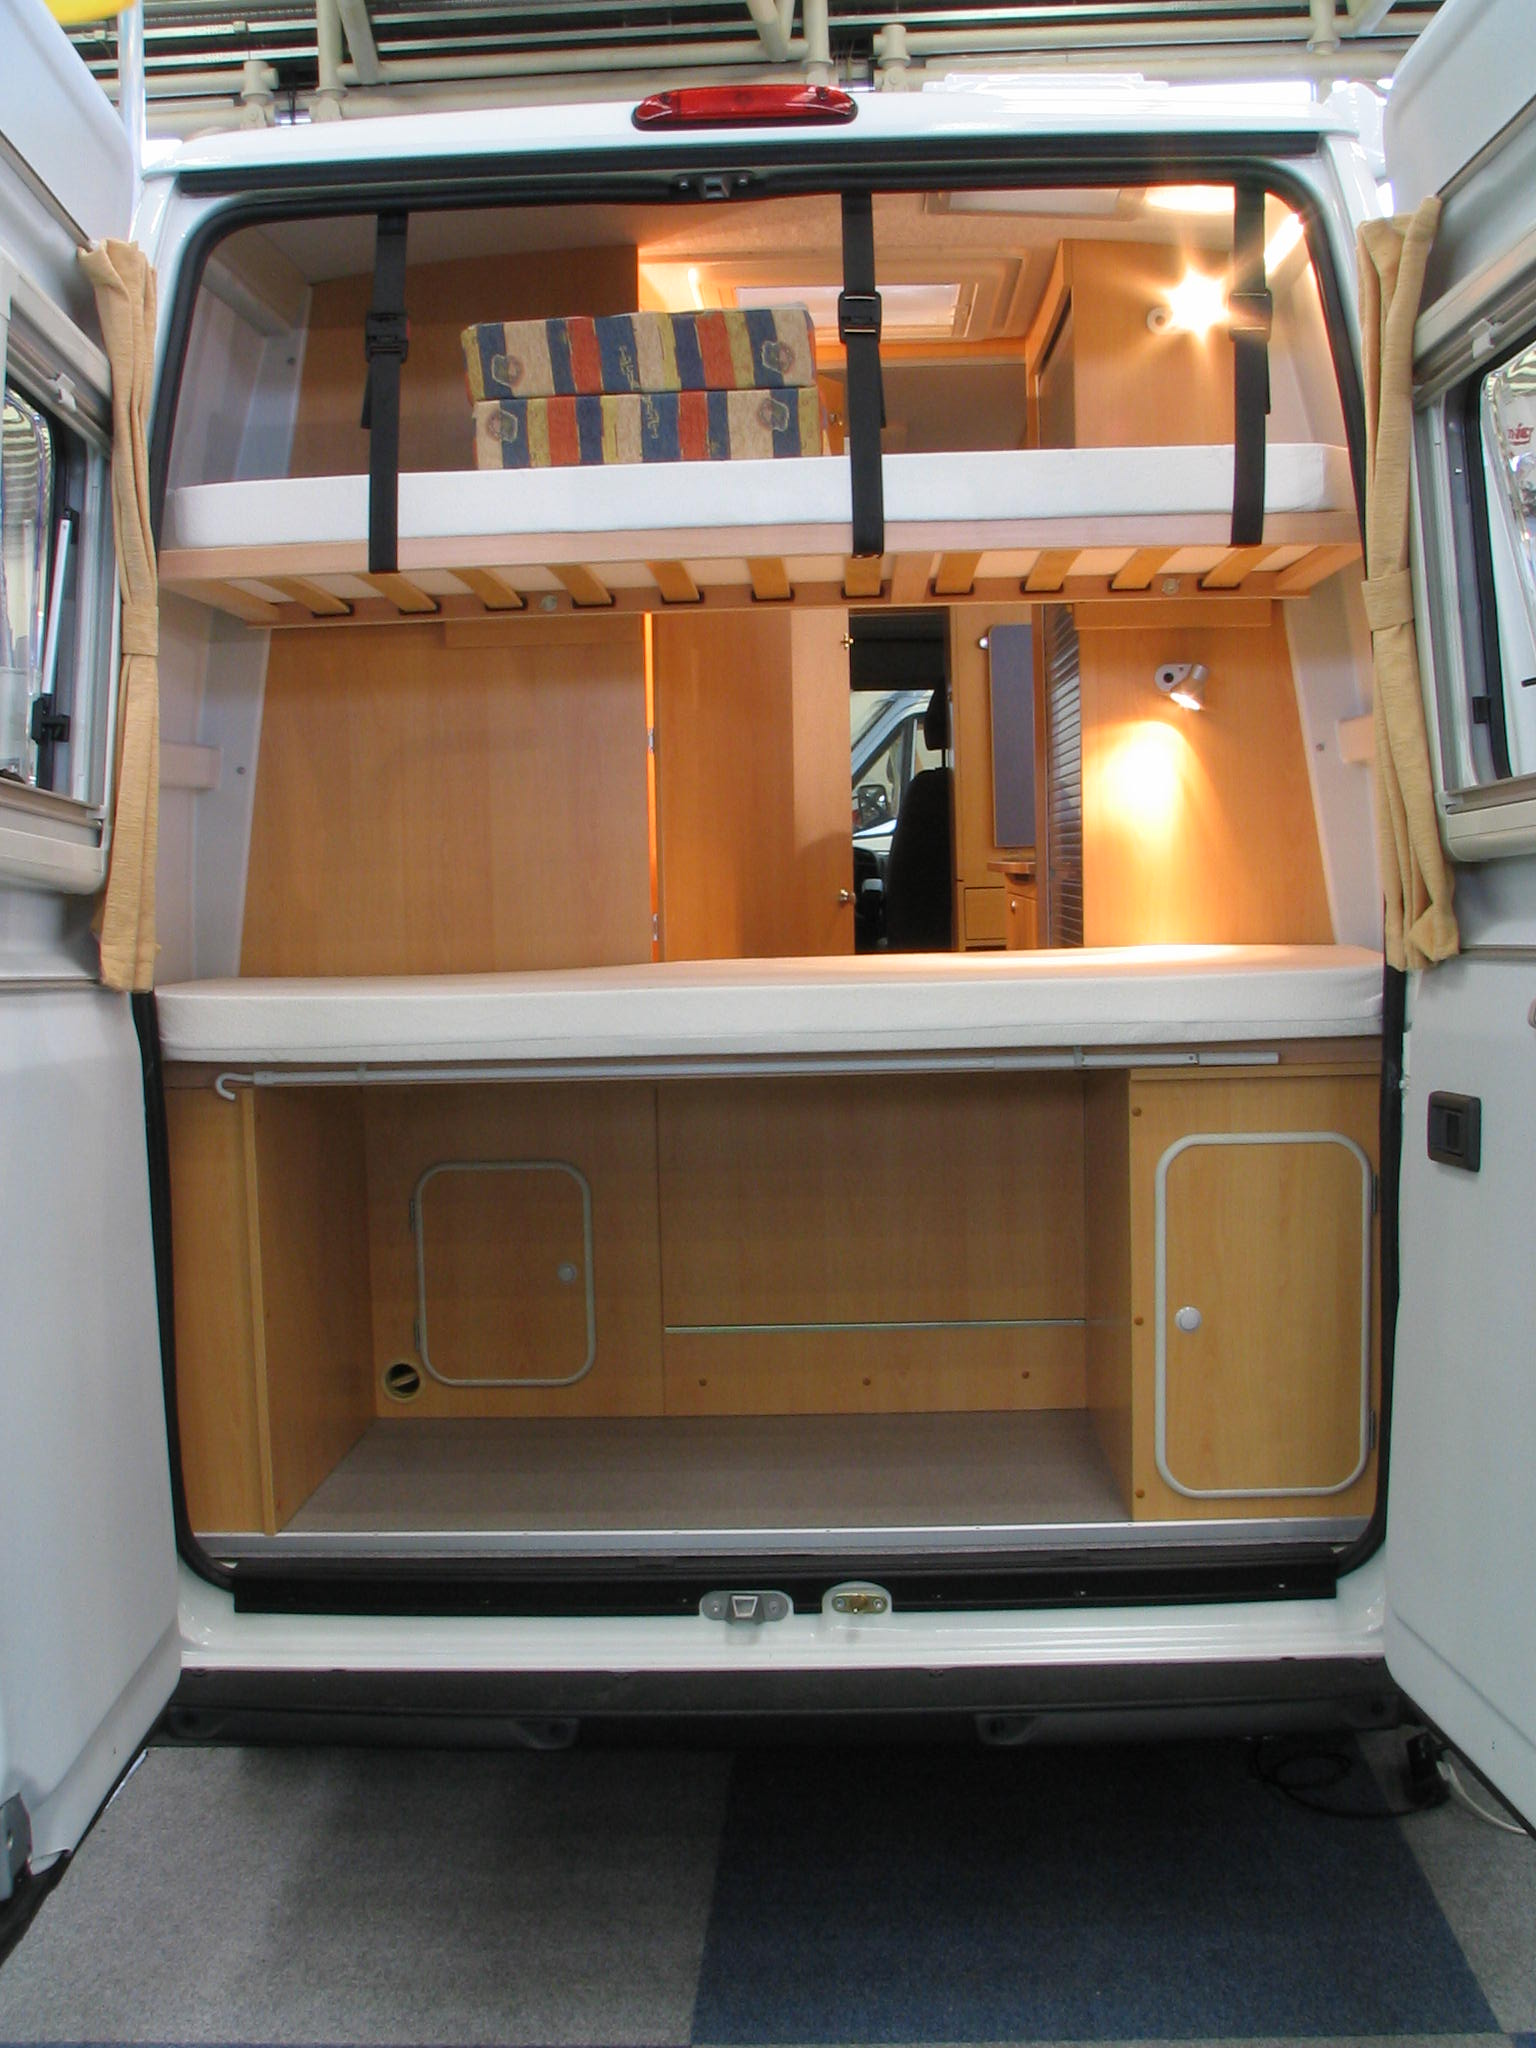 Fiat ducato campingausbau mit stockbetten for Interieur fiat ducato 2000